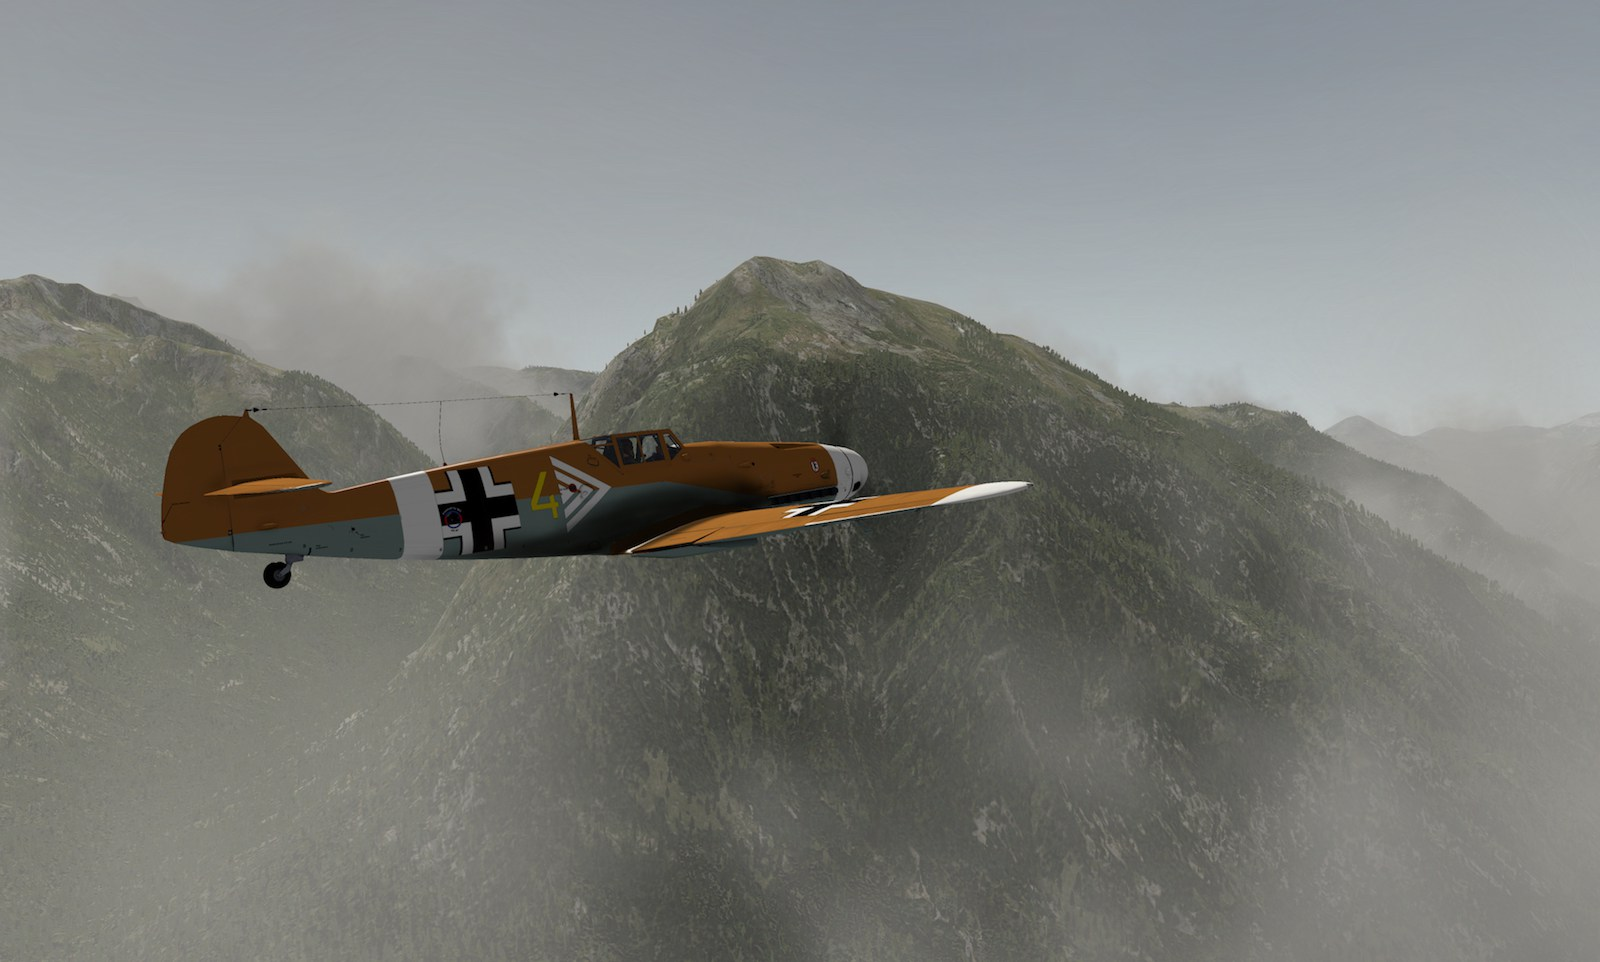 MLAeroDG Me-109 overview 4